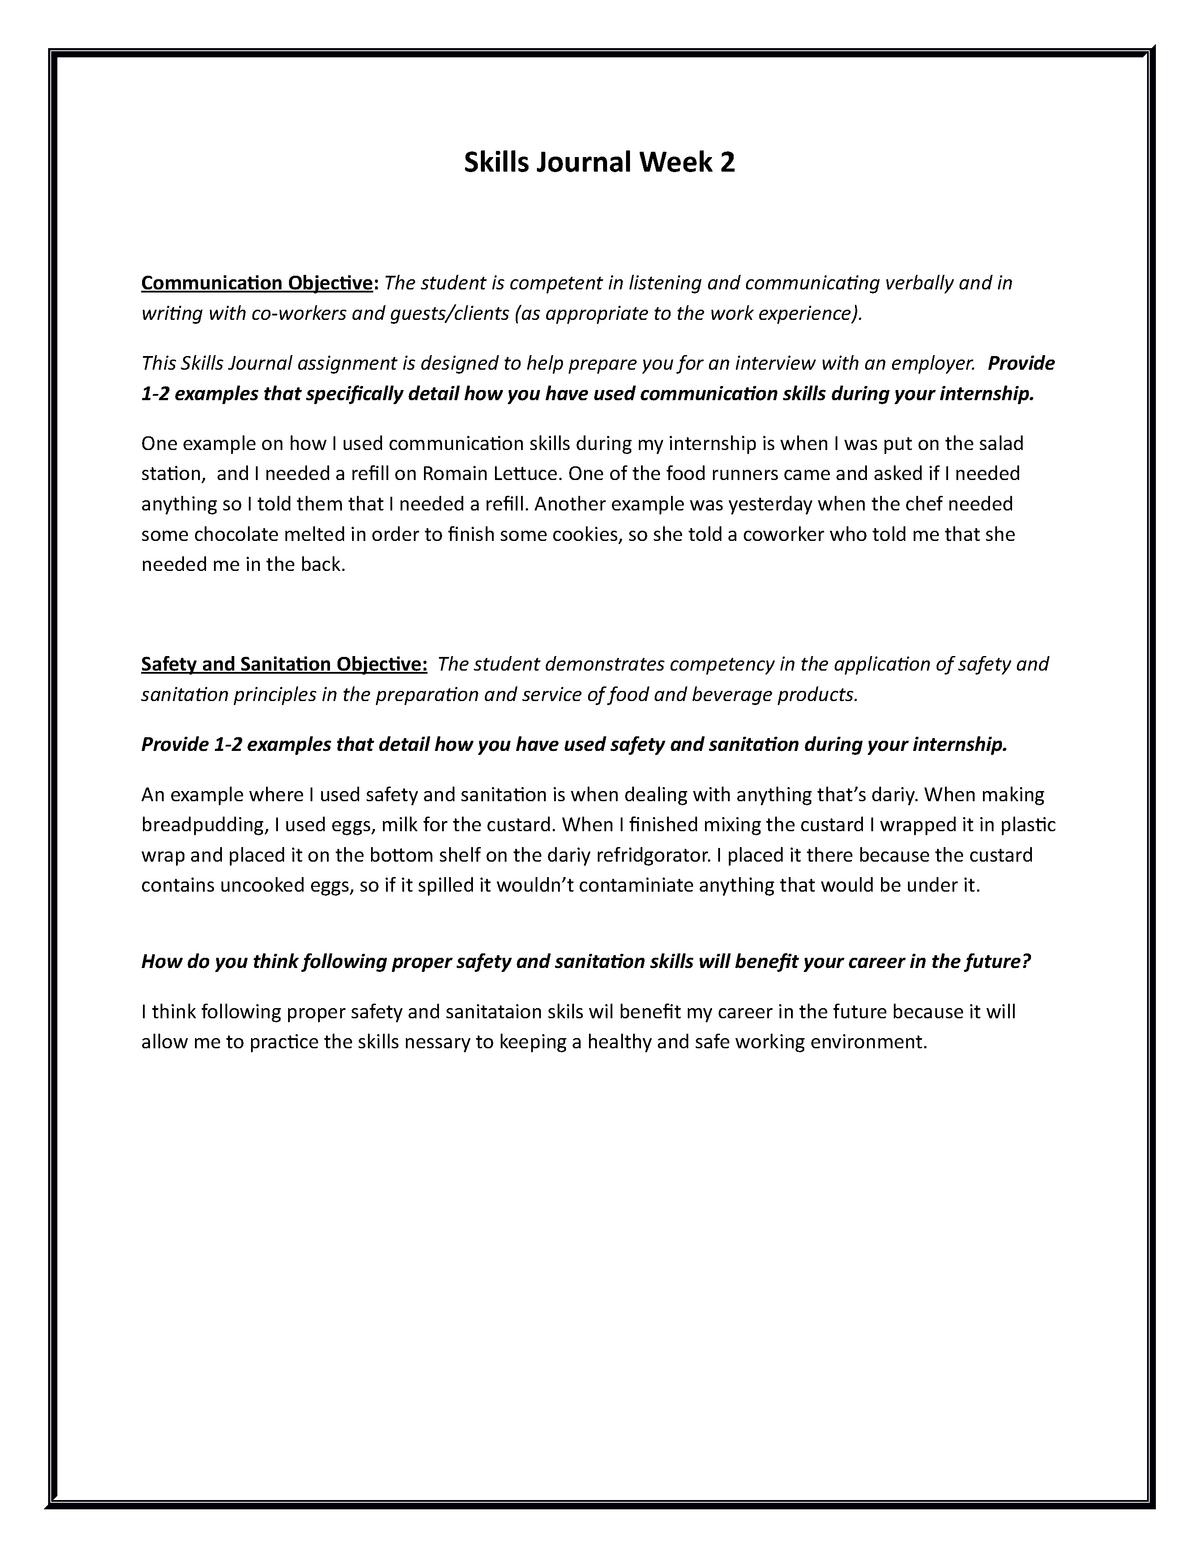 Skills Journal Week 2 - Homework - BPA 2276 - JWU - StuDocu